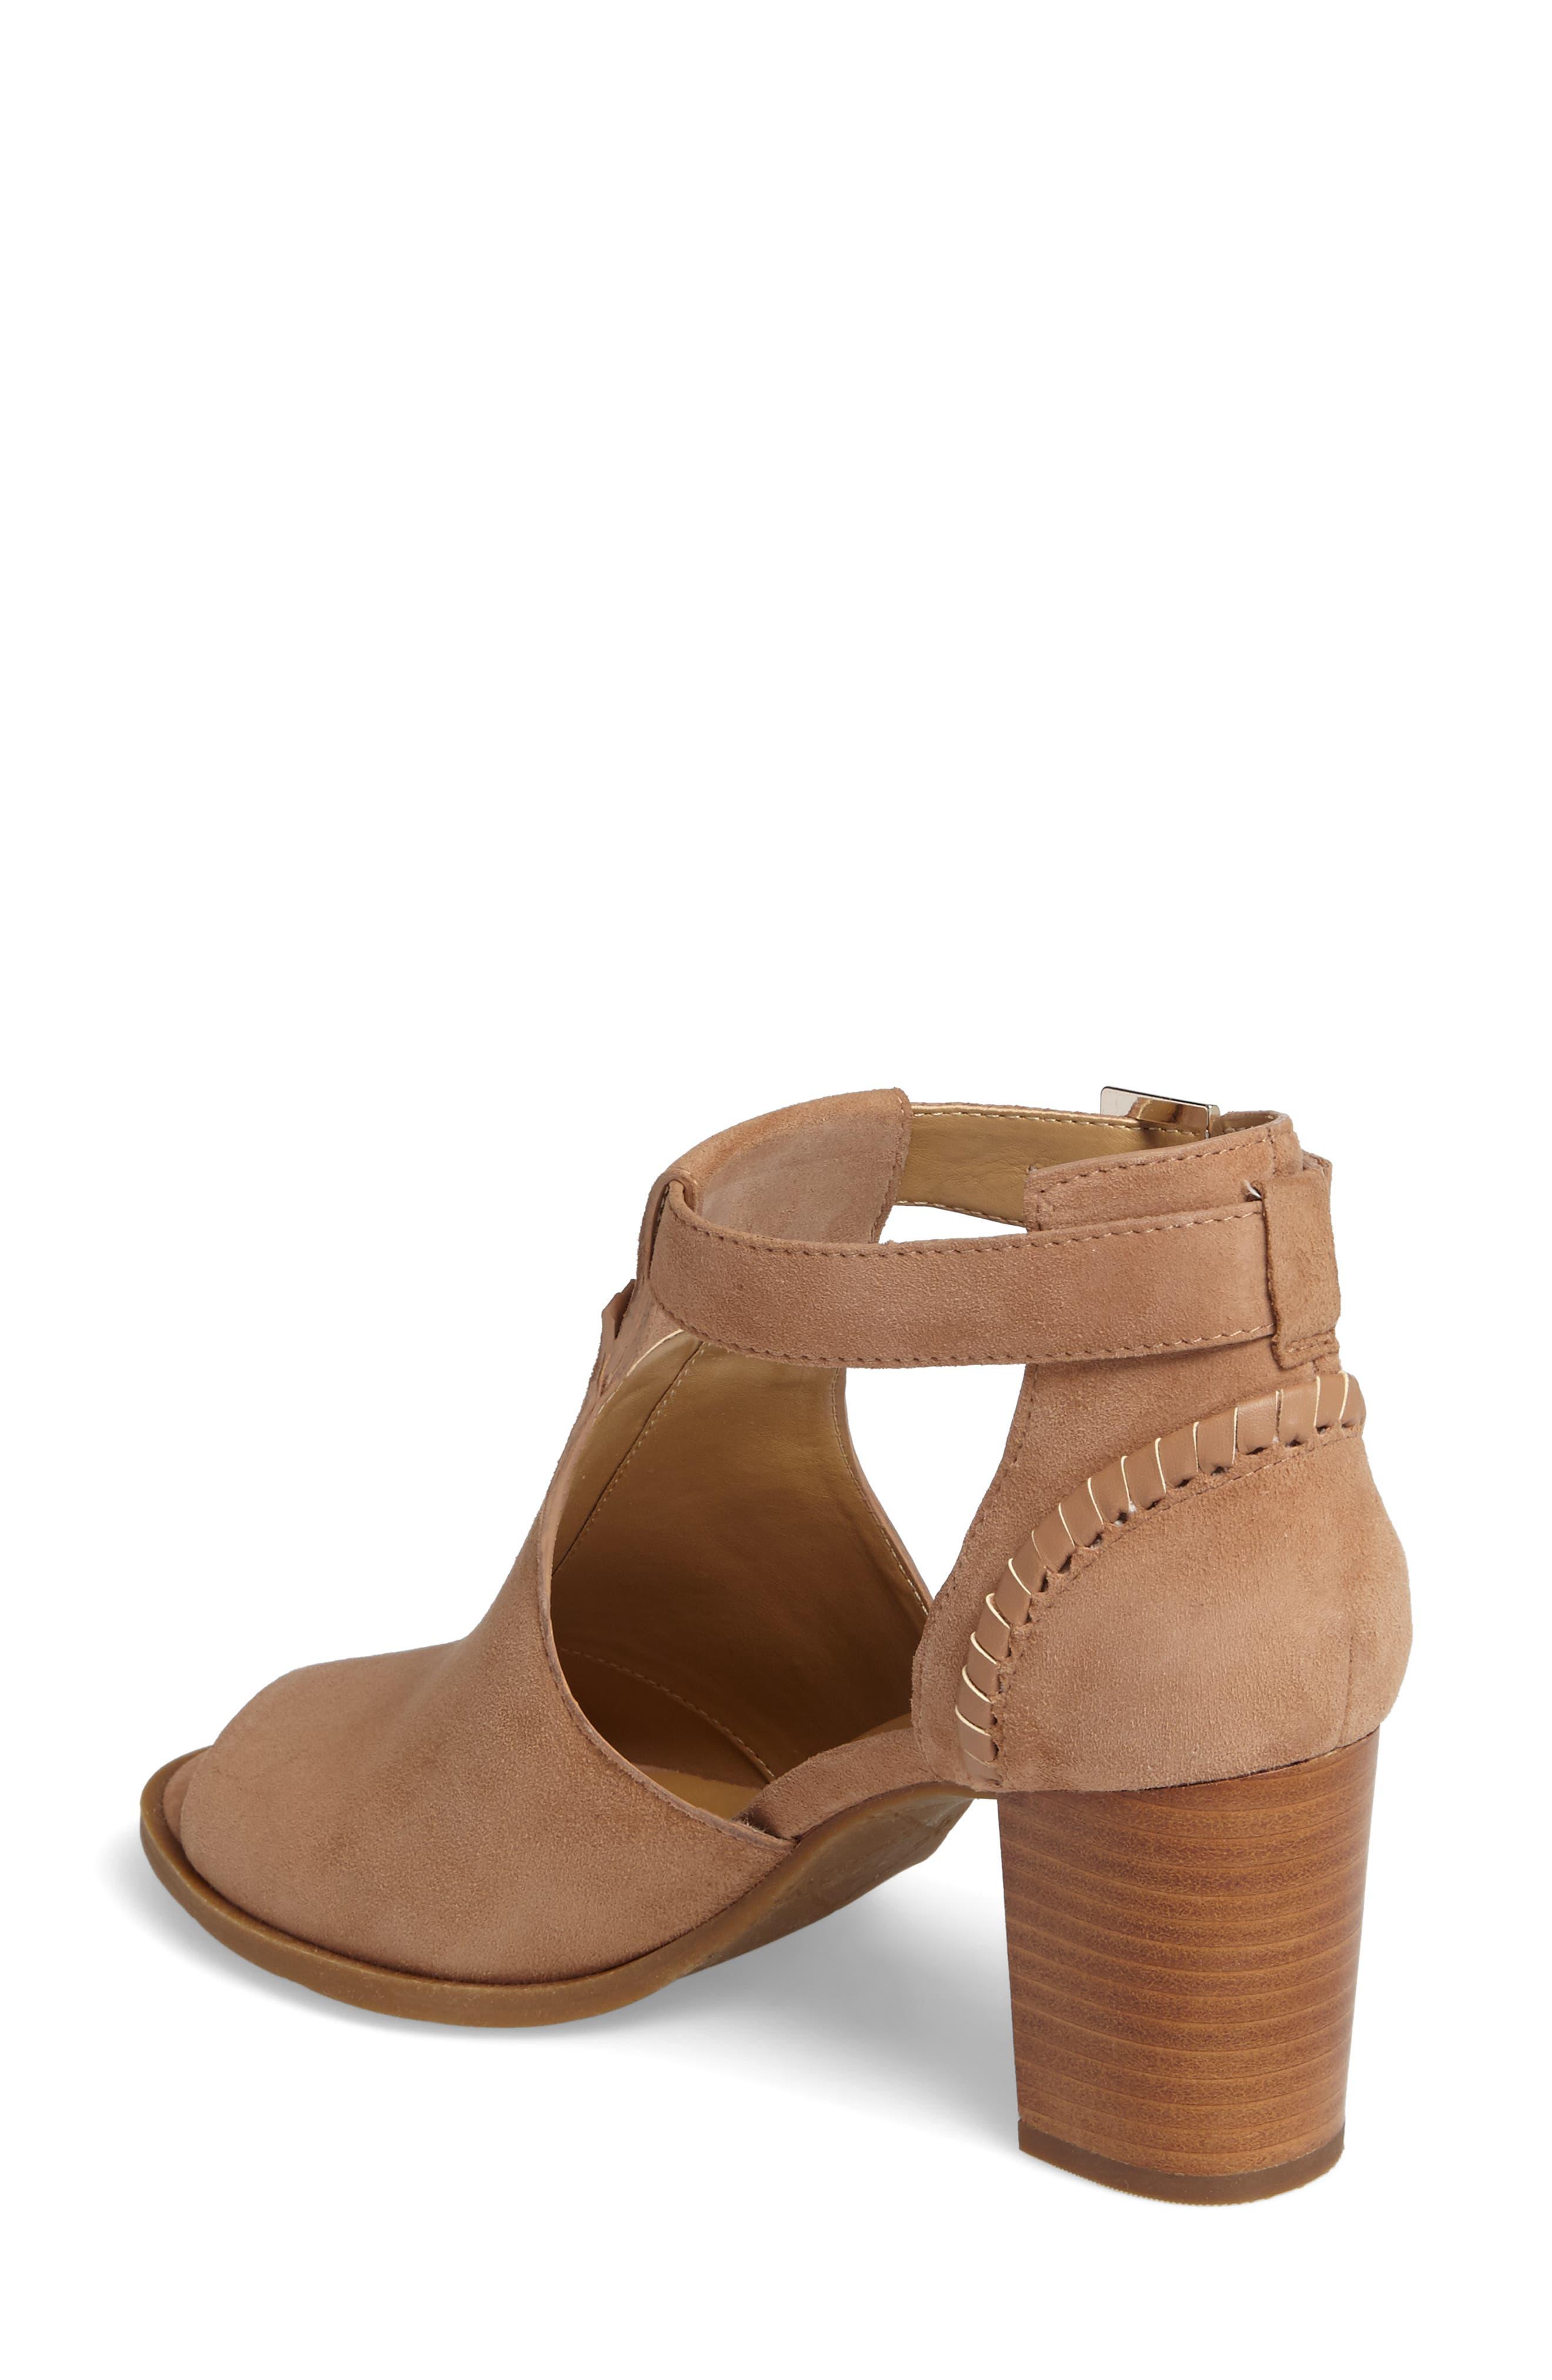 Cameron Block Heel Sandal,                             Alternate thumbnail 14, color,